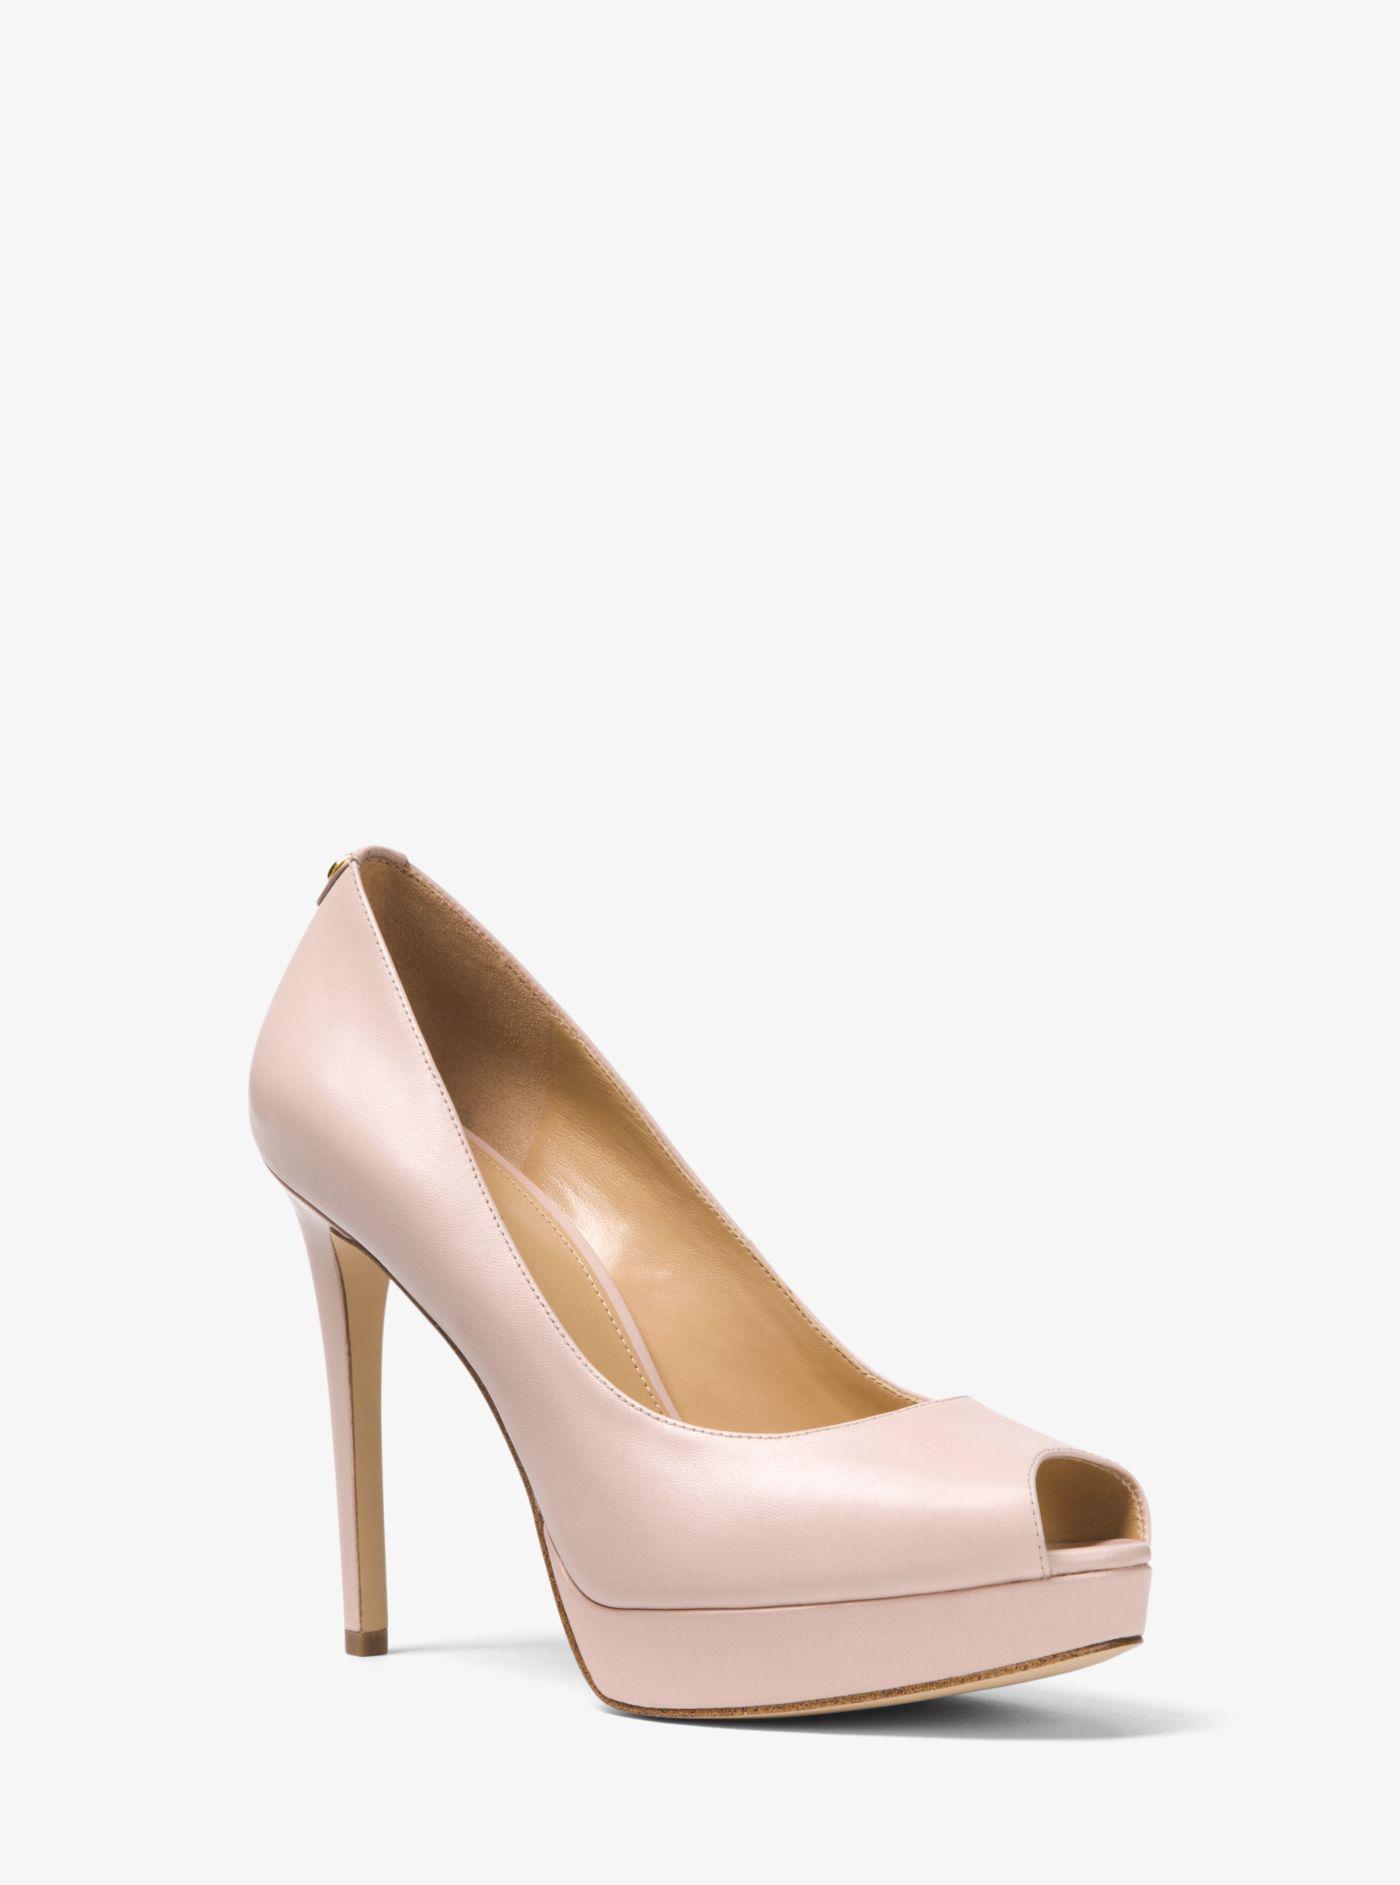 7e9e22e15688 Lyst - Michael Kors Erika Leather Peep-toe Pump in Pink